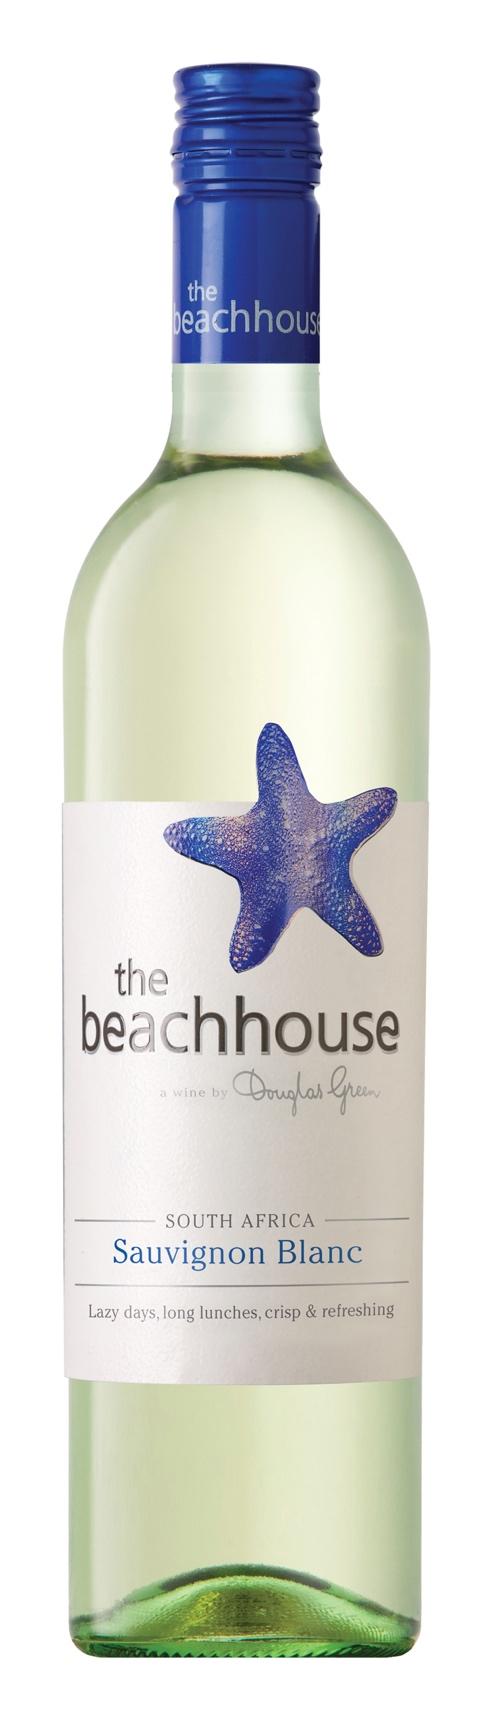 Wine of the Weekend: The Beachhouse Sauvignon Blanc 2017